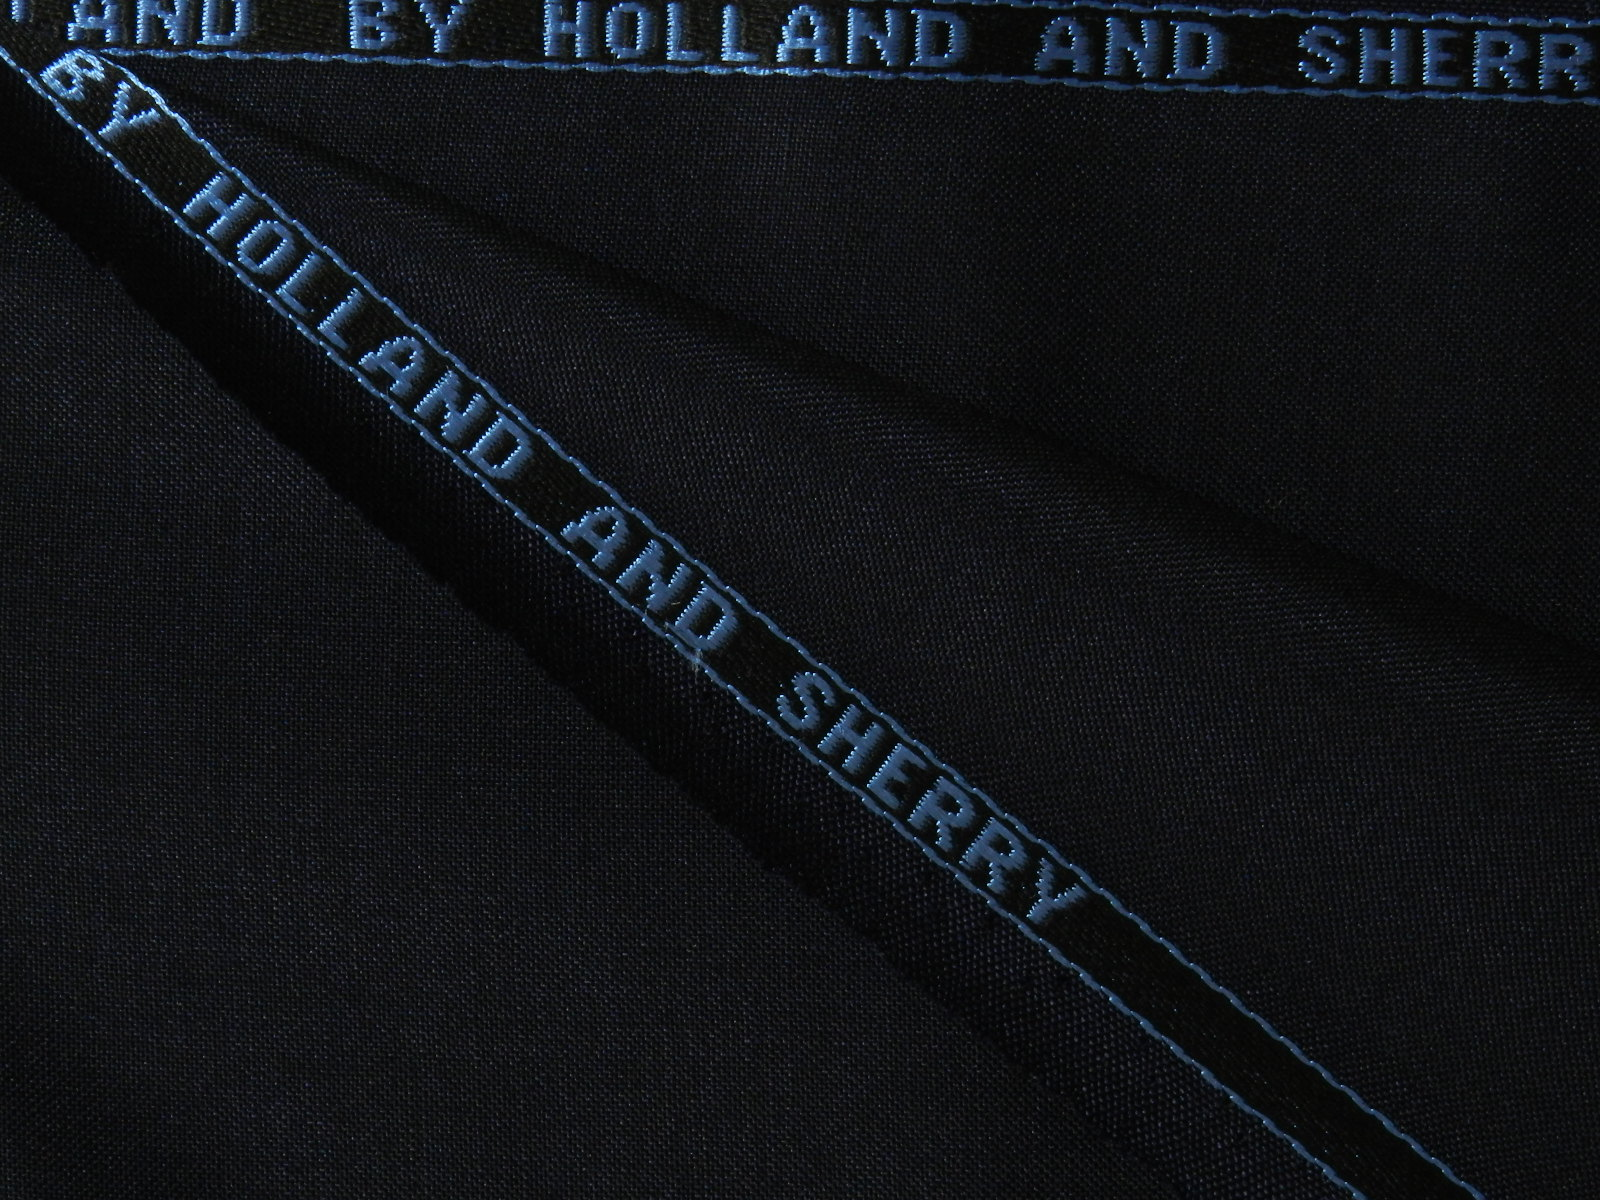 HOLLAND AND SHERRY(ホーランドアンドシェリー) / ENGLAND / モヘア / ウール / ネイビー 系 / 織り柄 系 / super 100'S